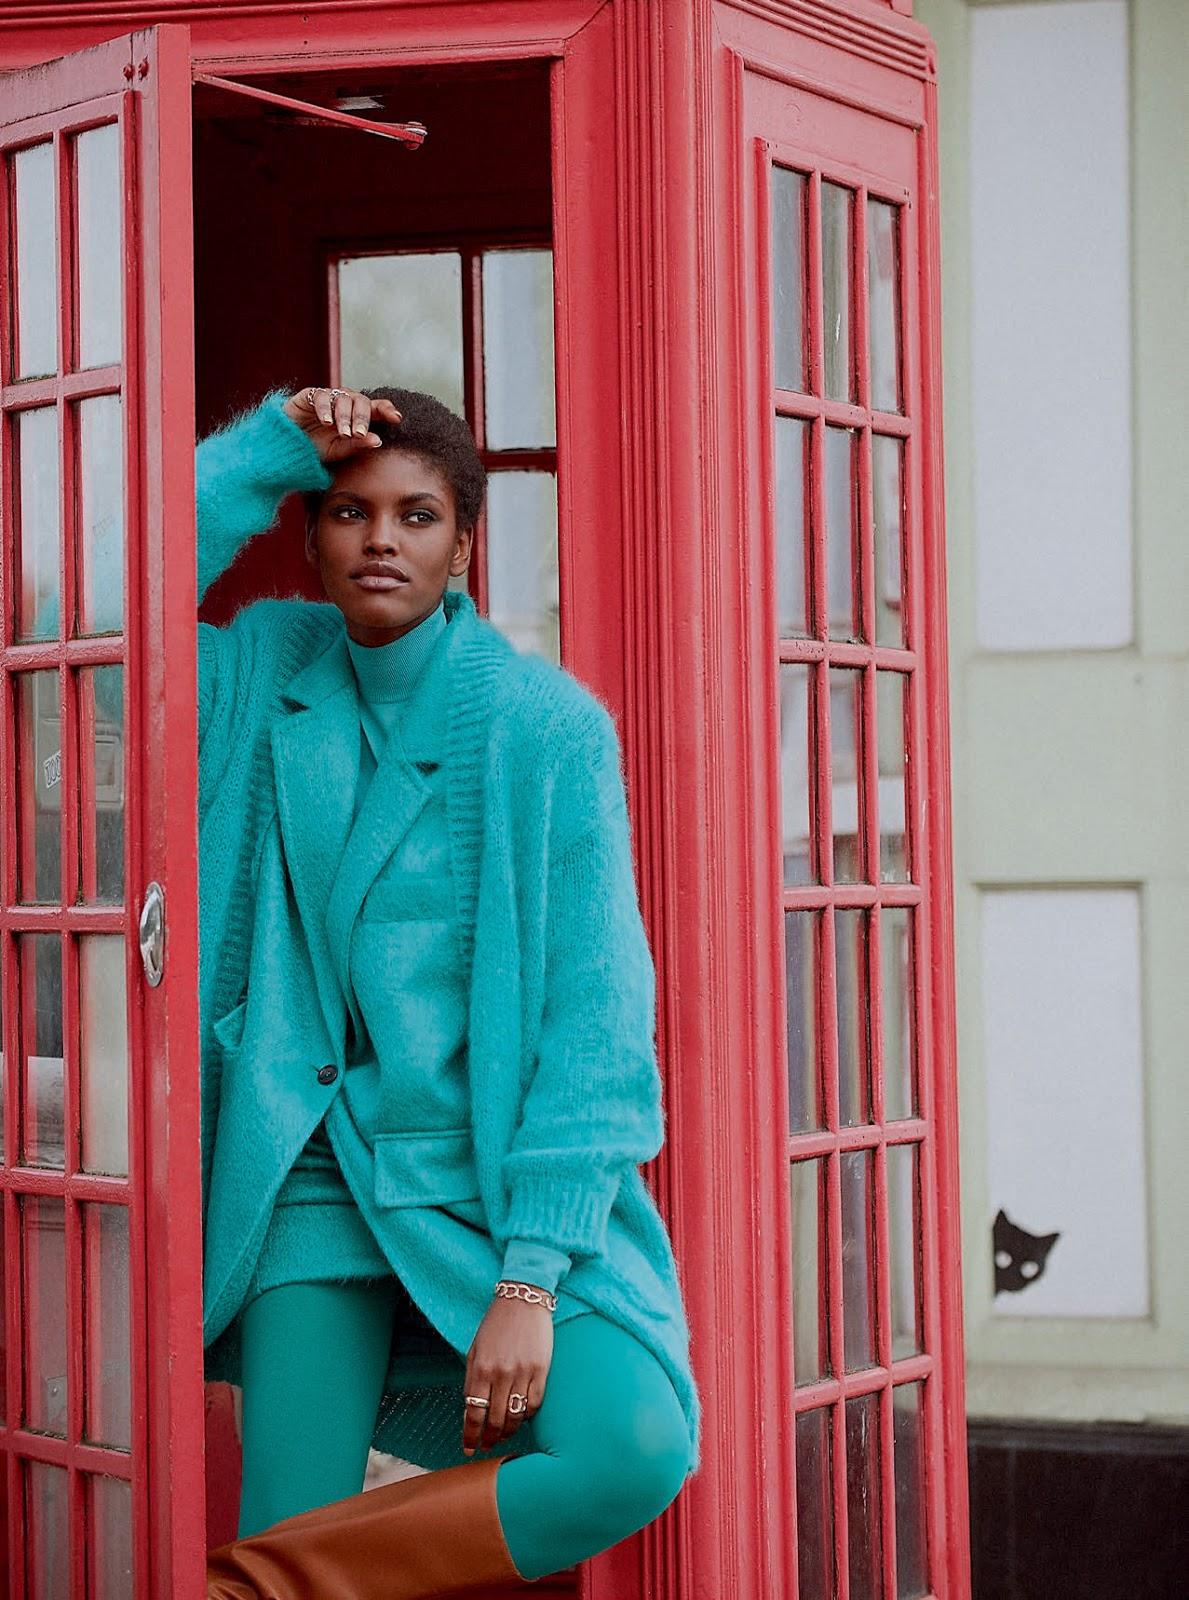 Amilna Estevao by Regan Cameron for Harper's Bazaar UK Sept 2019 (11).jpg